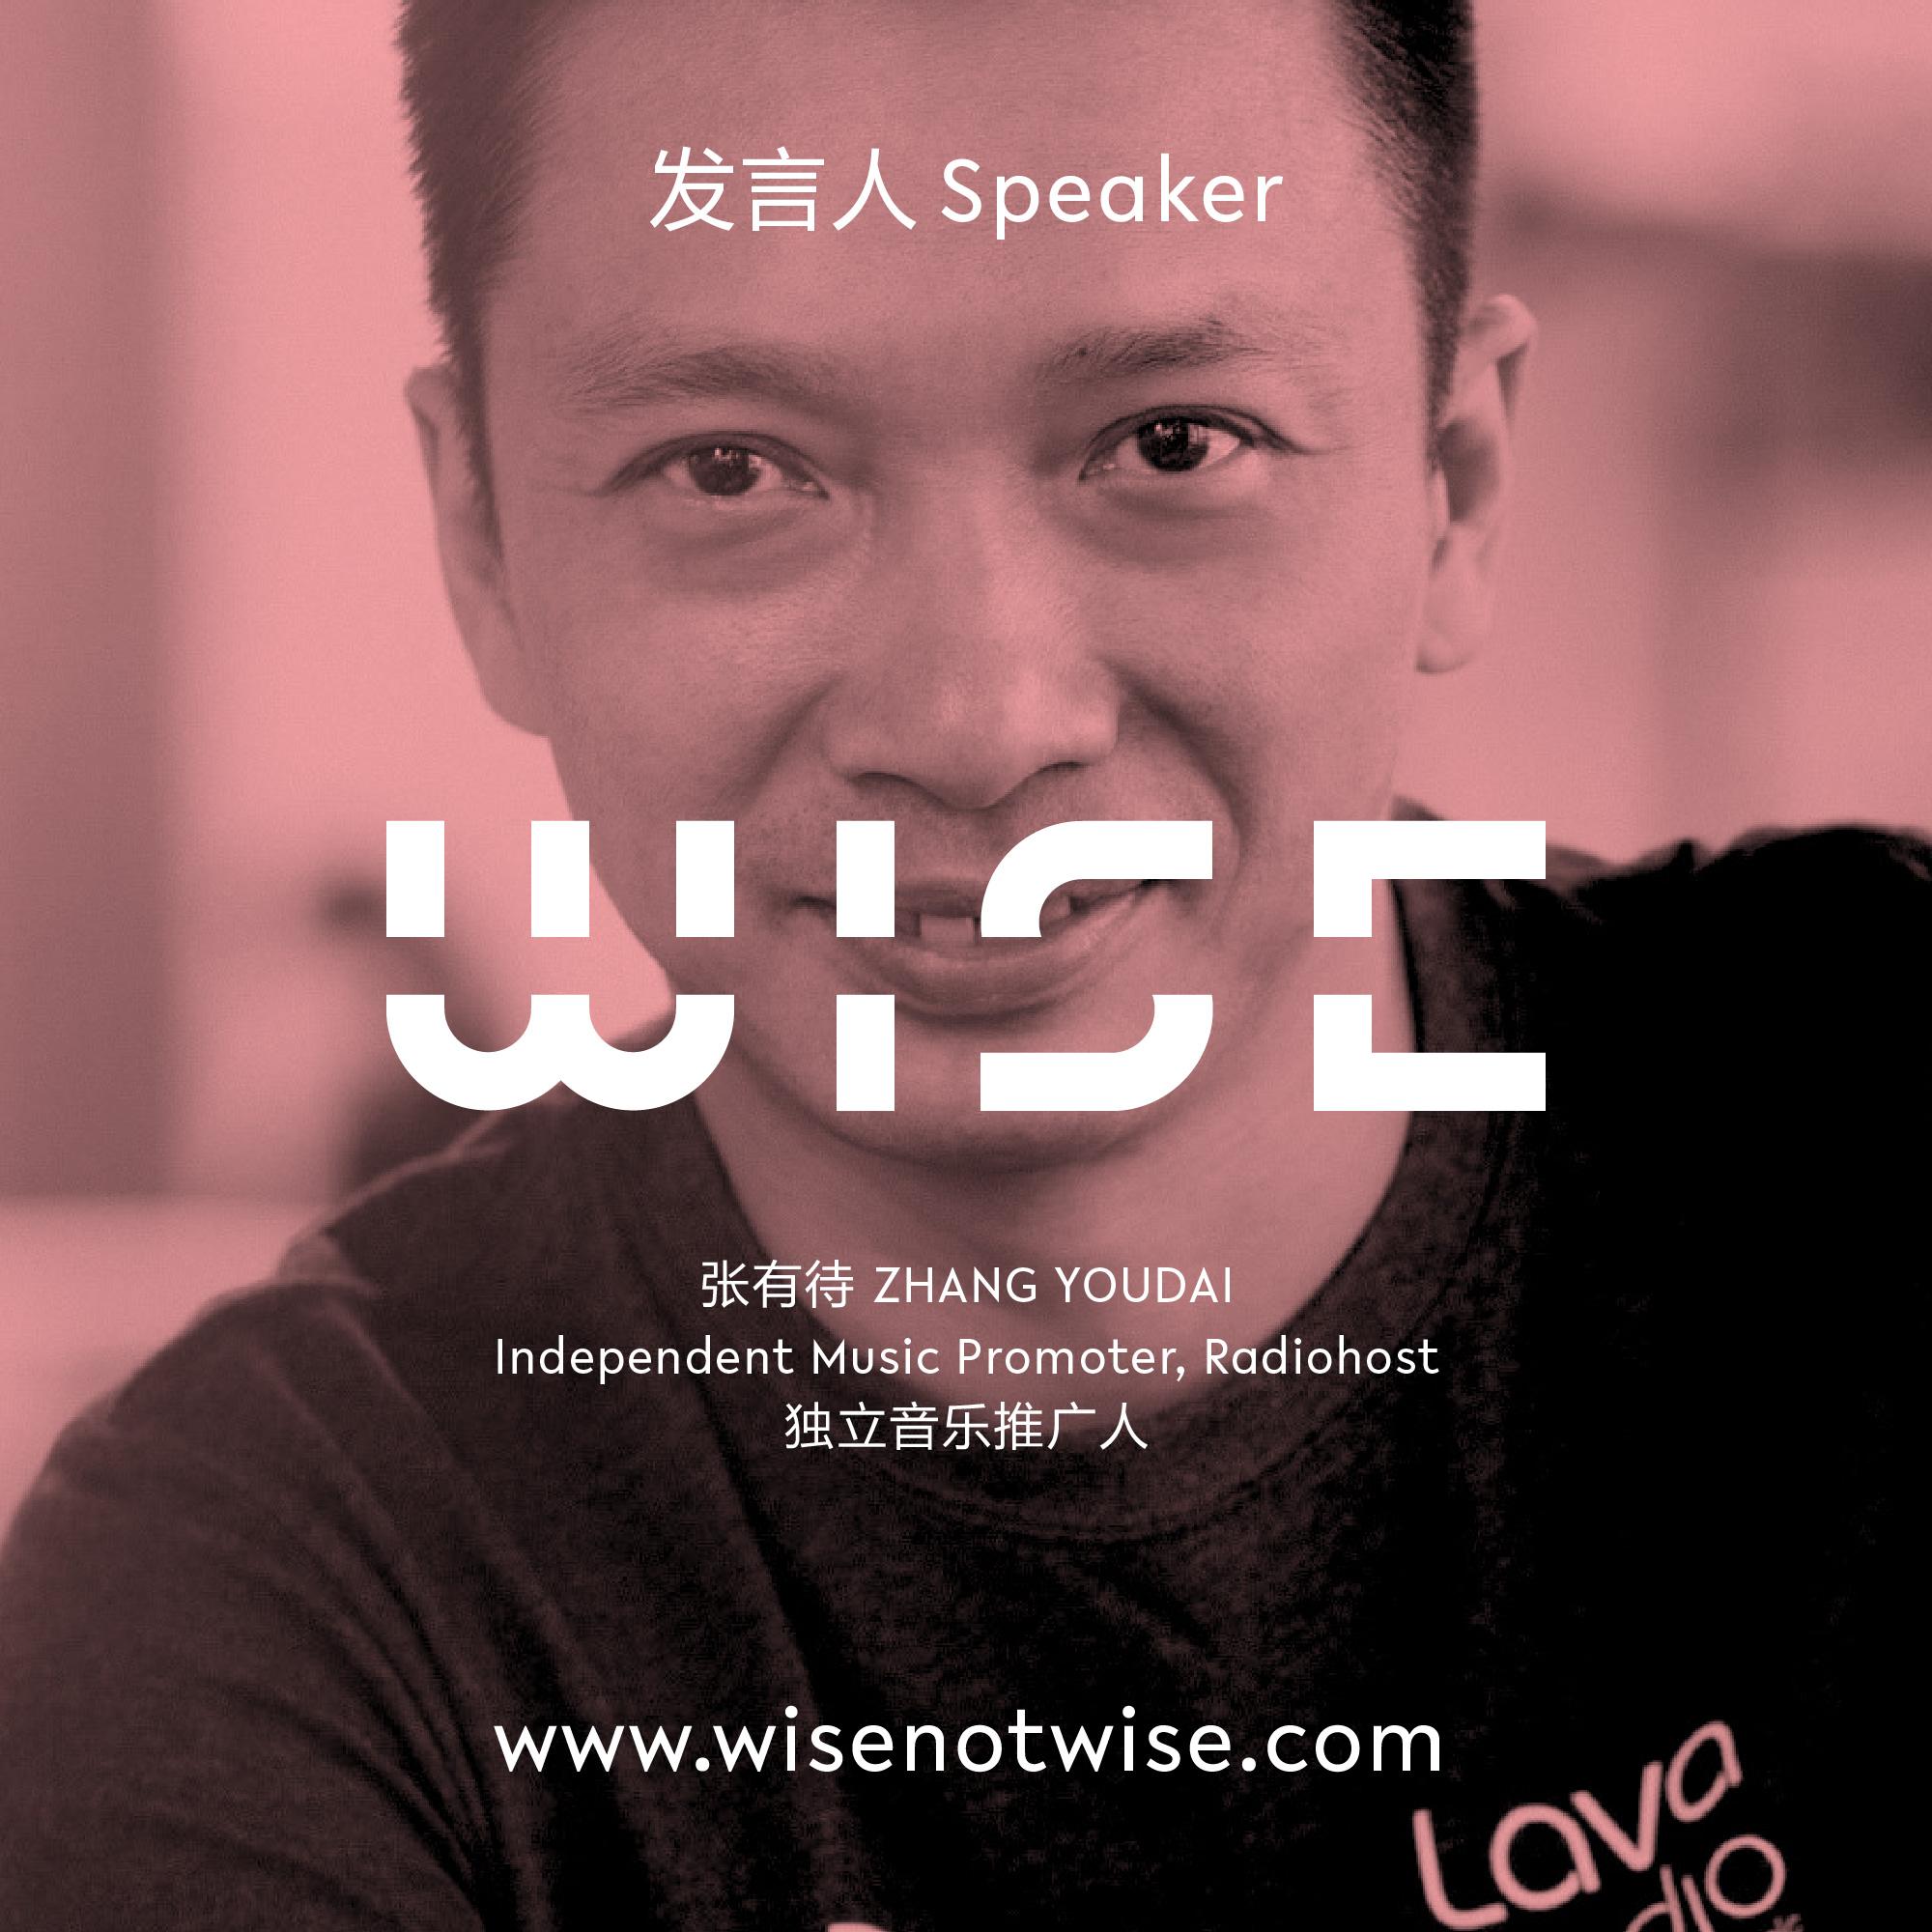 Zhang Youdai, Radiohost